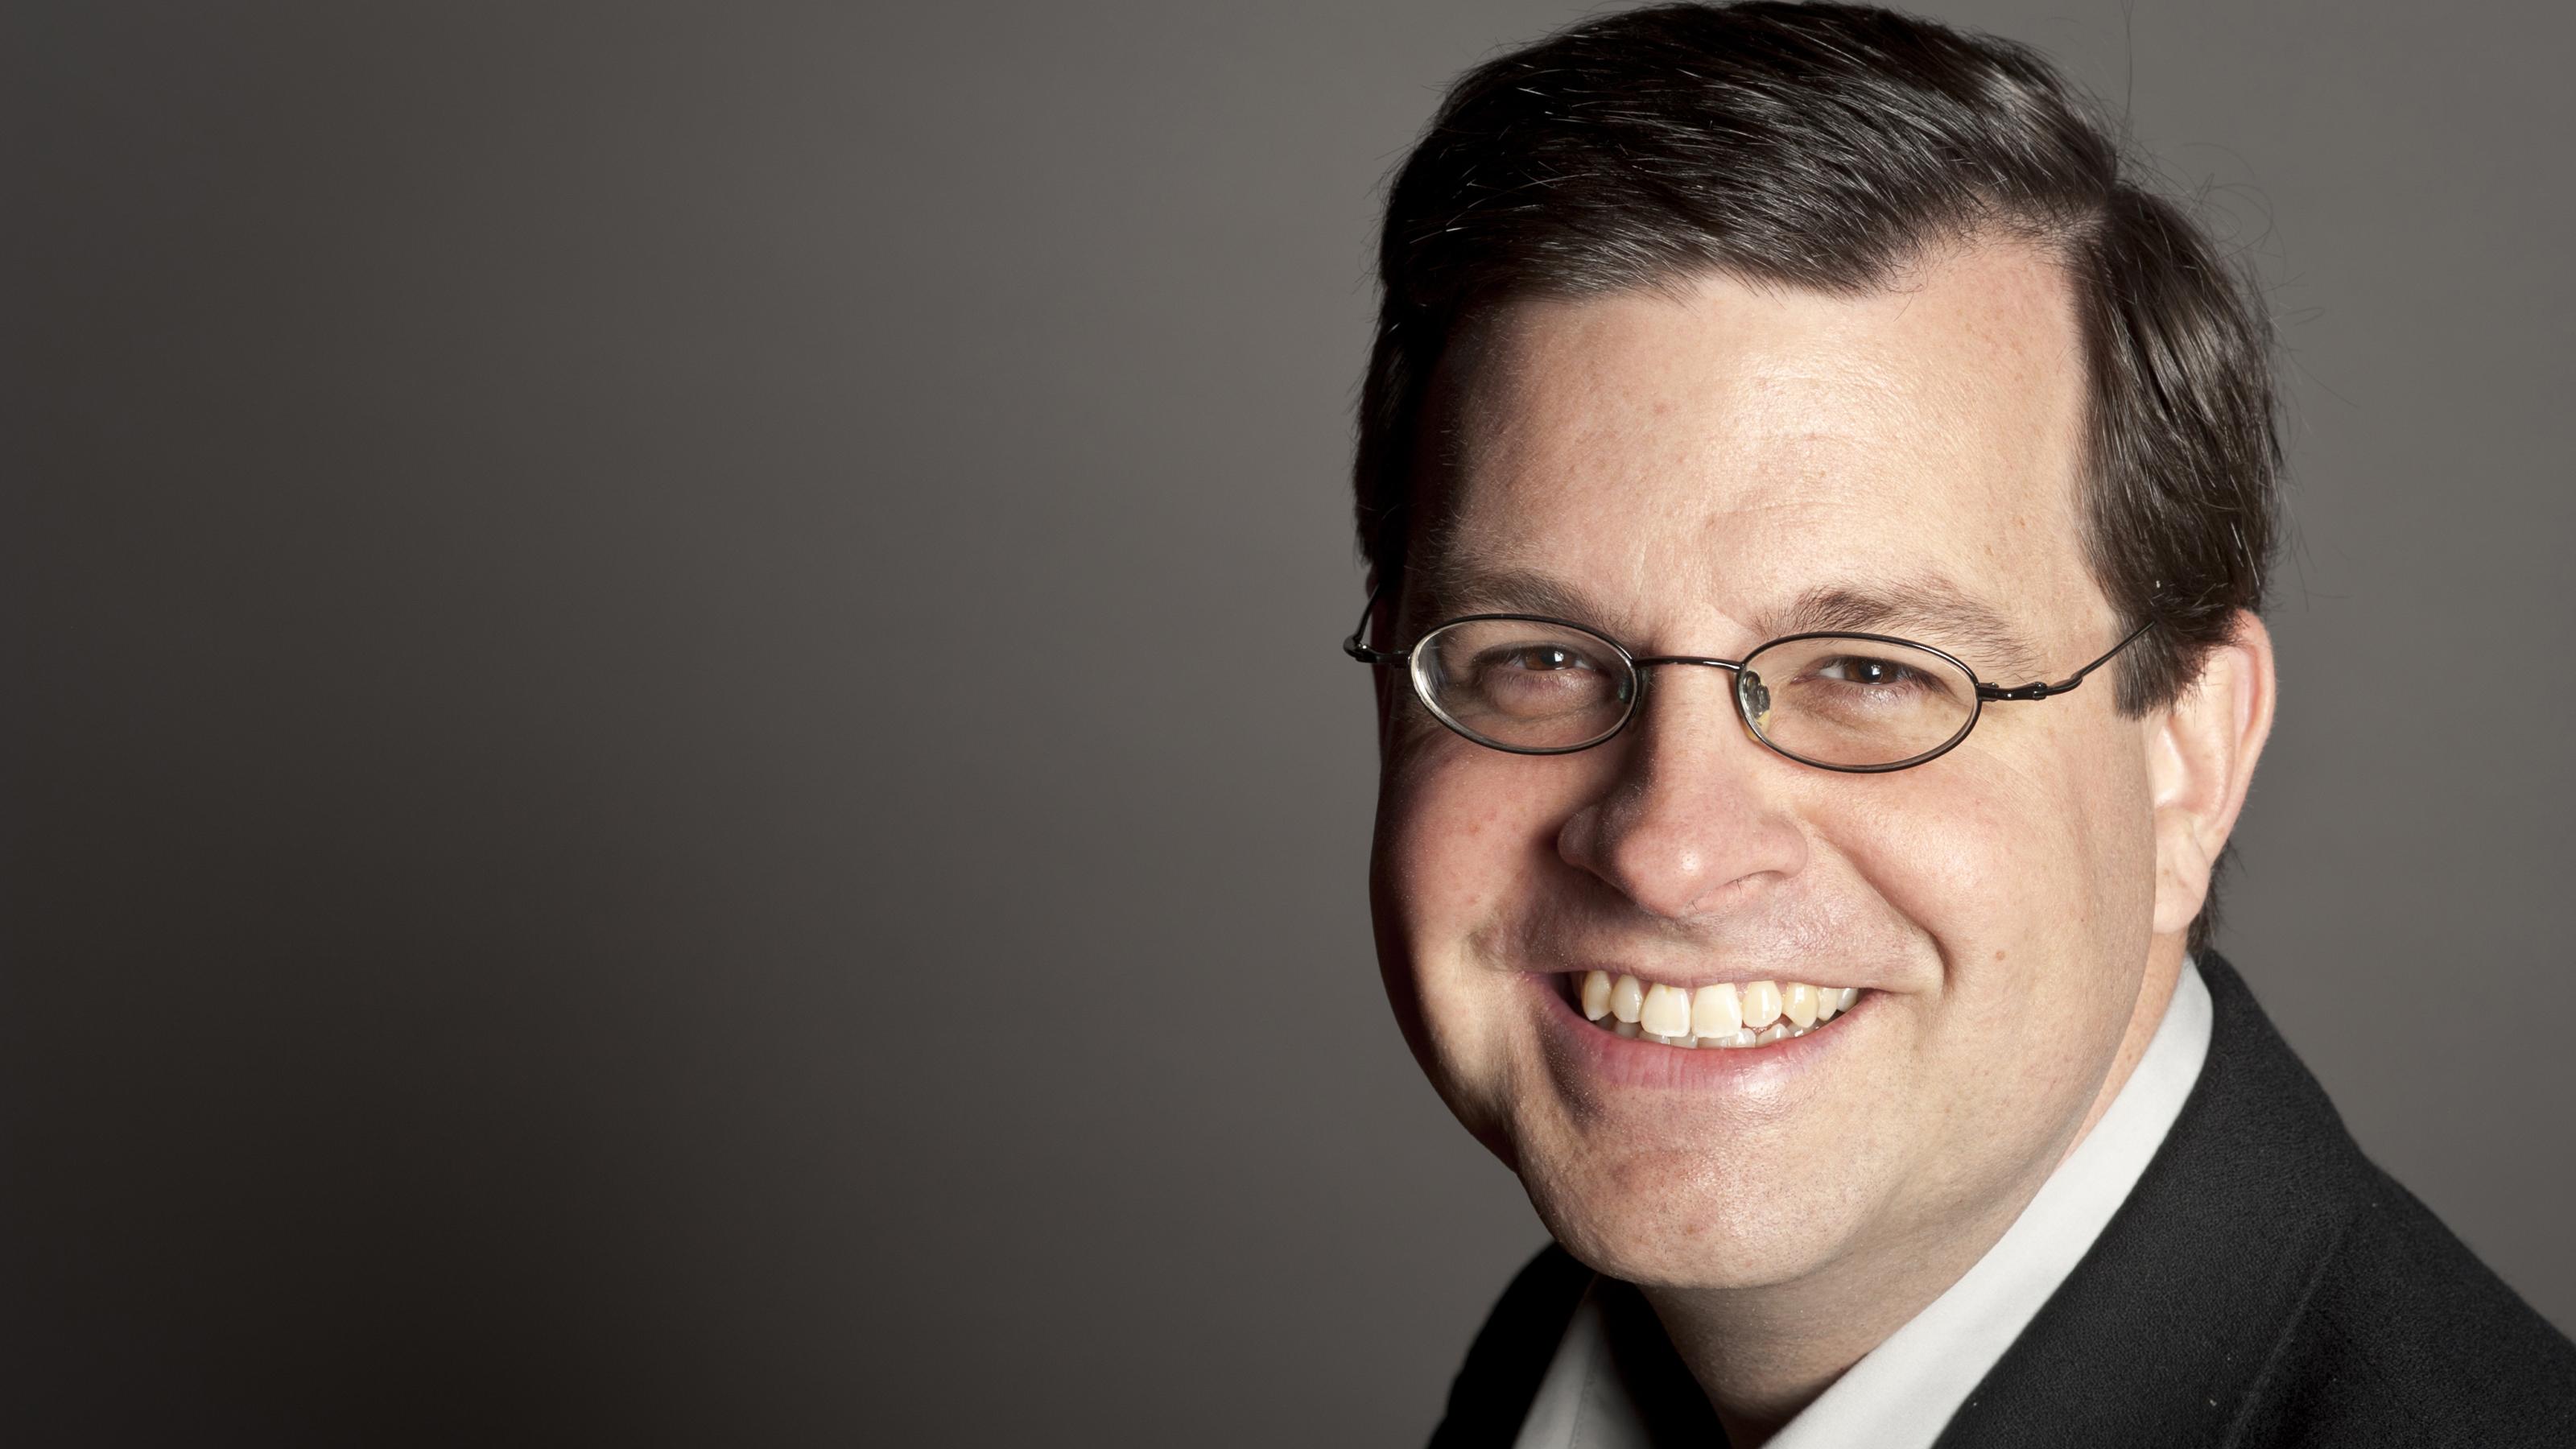 Dr Brian Biettrich against a gray background